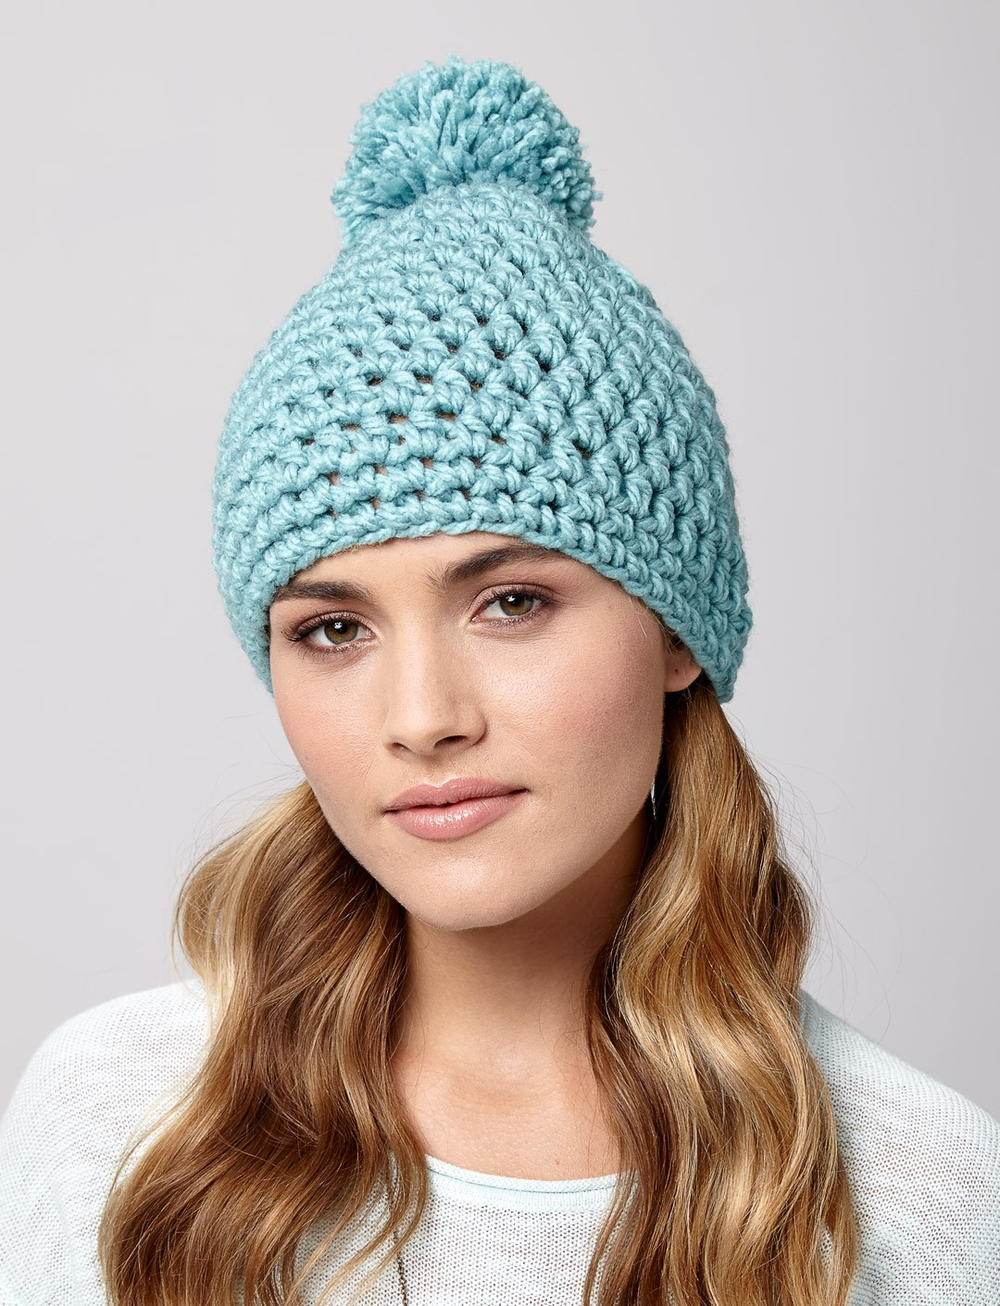 crochet hat patterns snow drift crochet hat jlmjygy